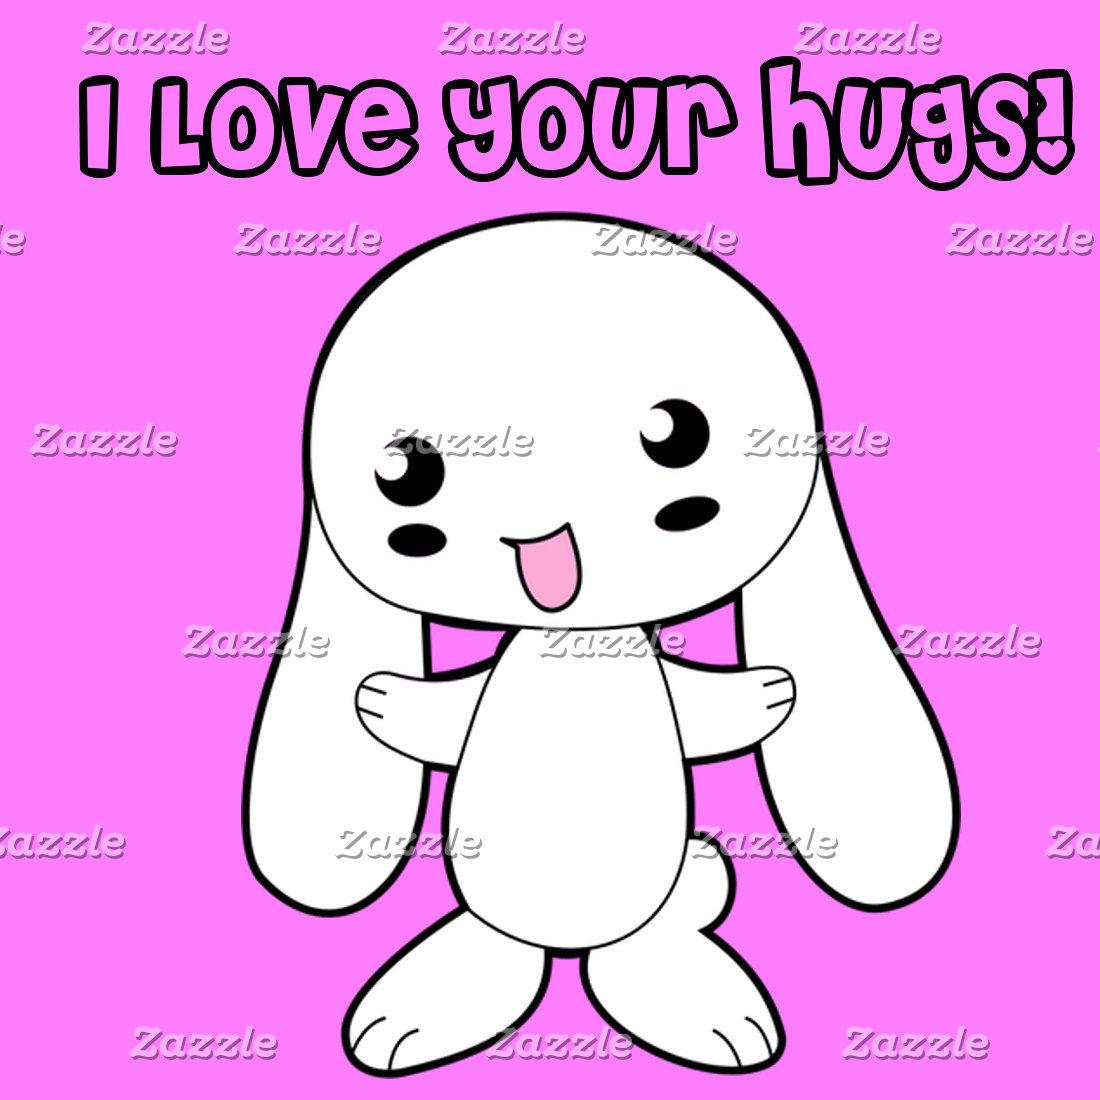 I Love Your Hugs!